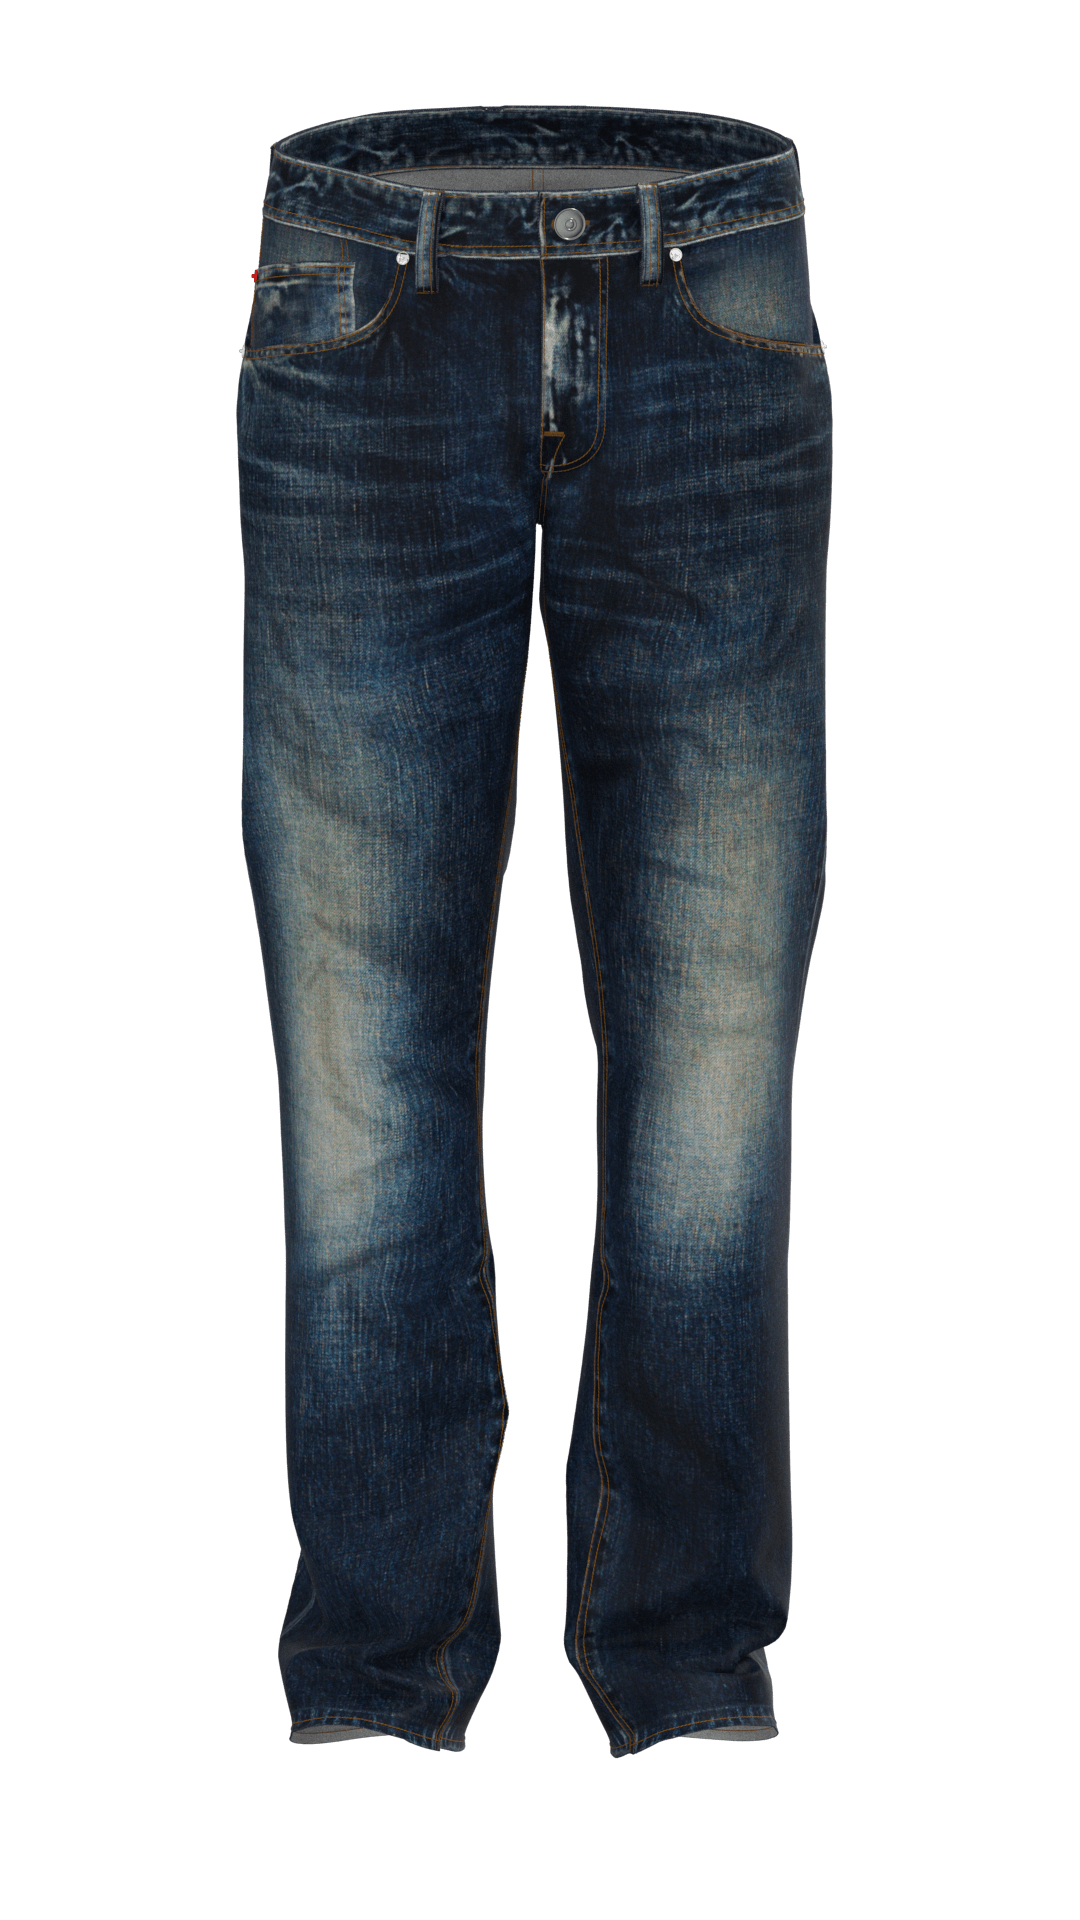 3d rendered jeans image